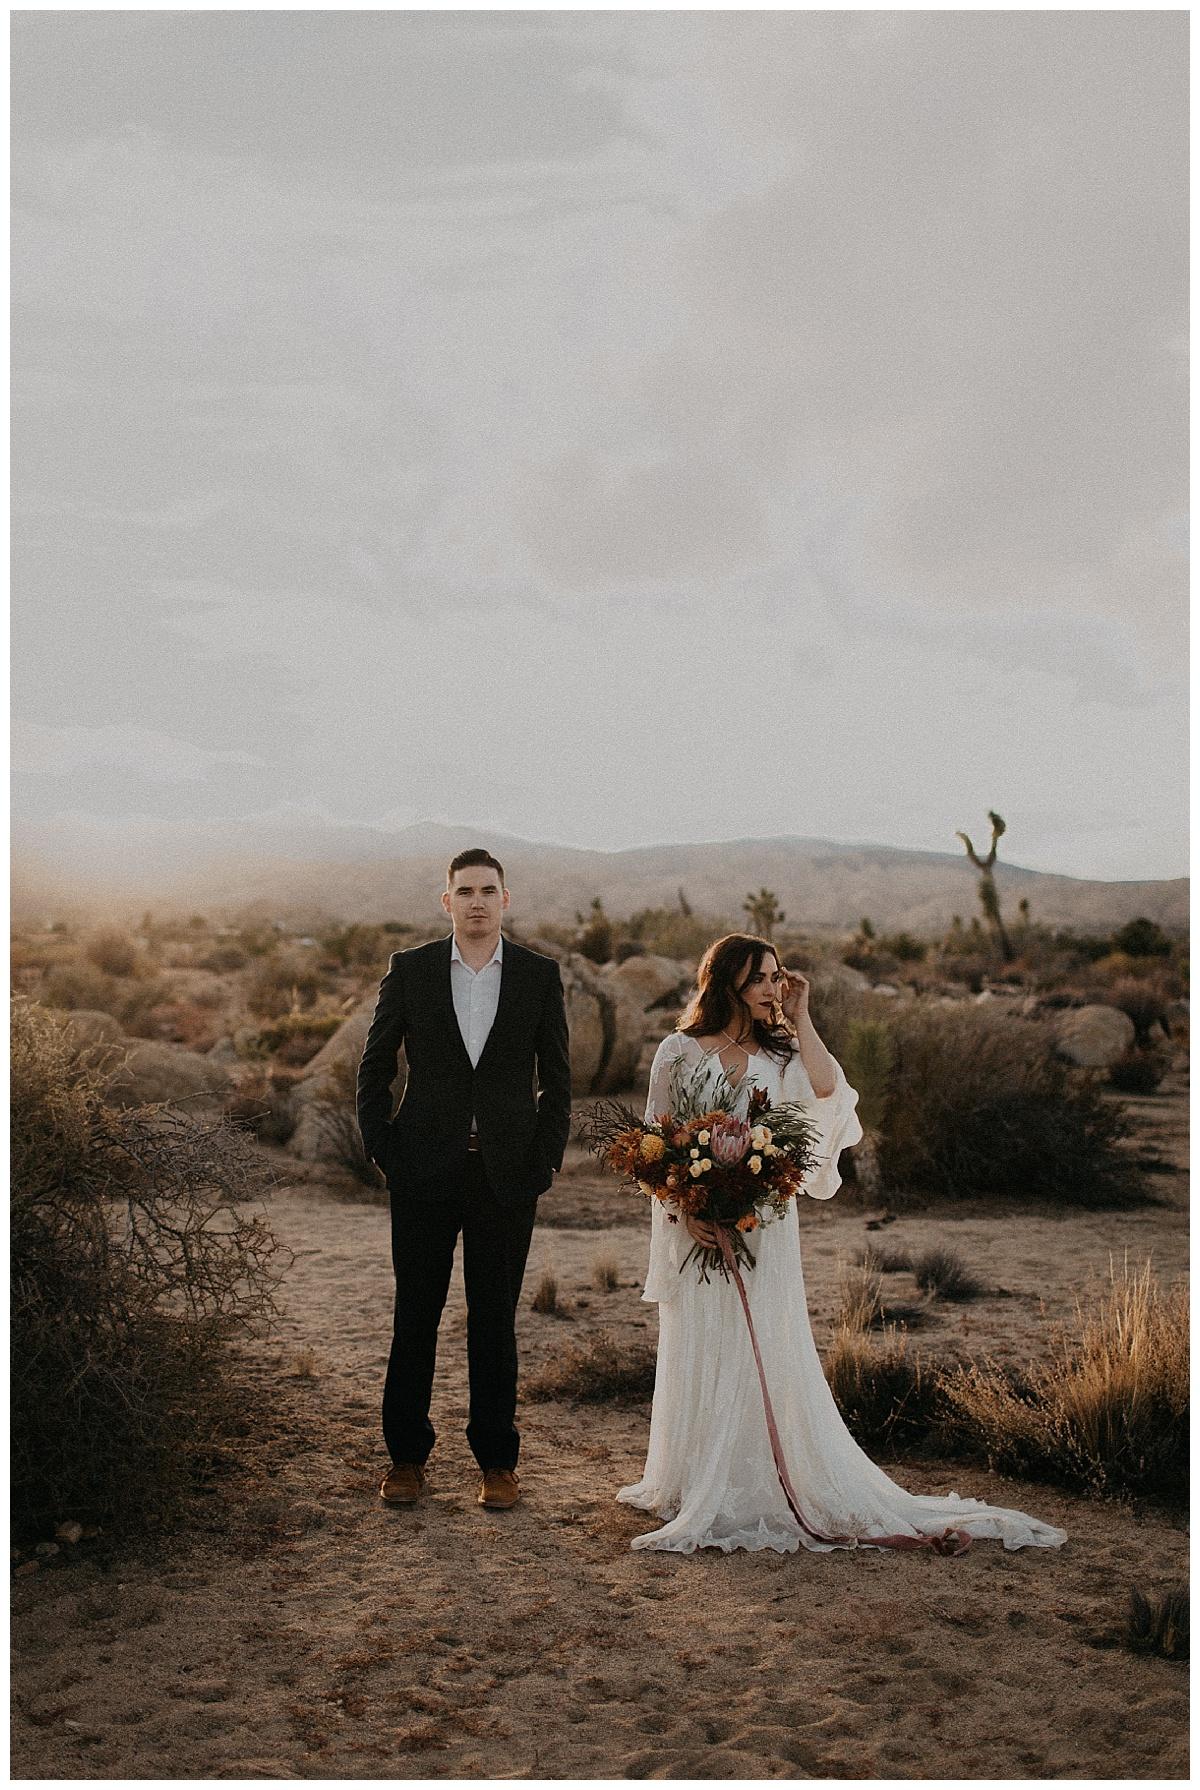 Bixby+Pine-PNW-Wedding-Planners-And-Designers_1312.jpg